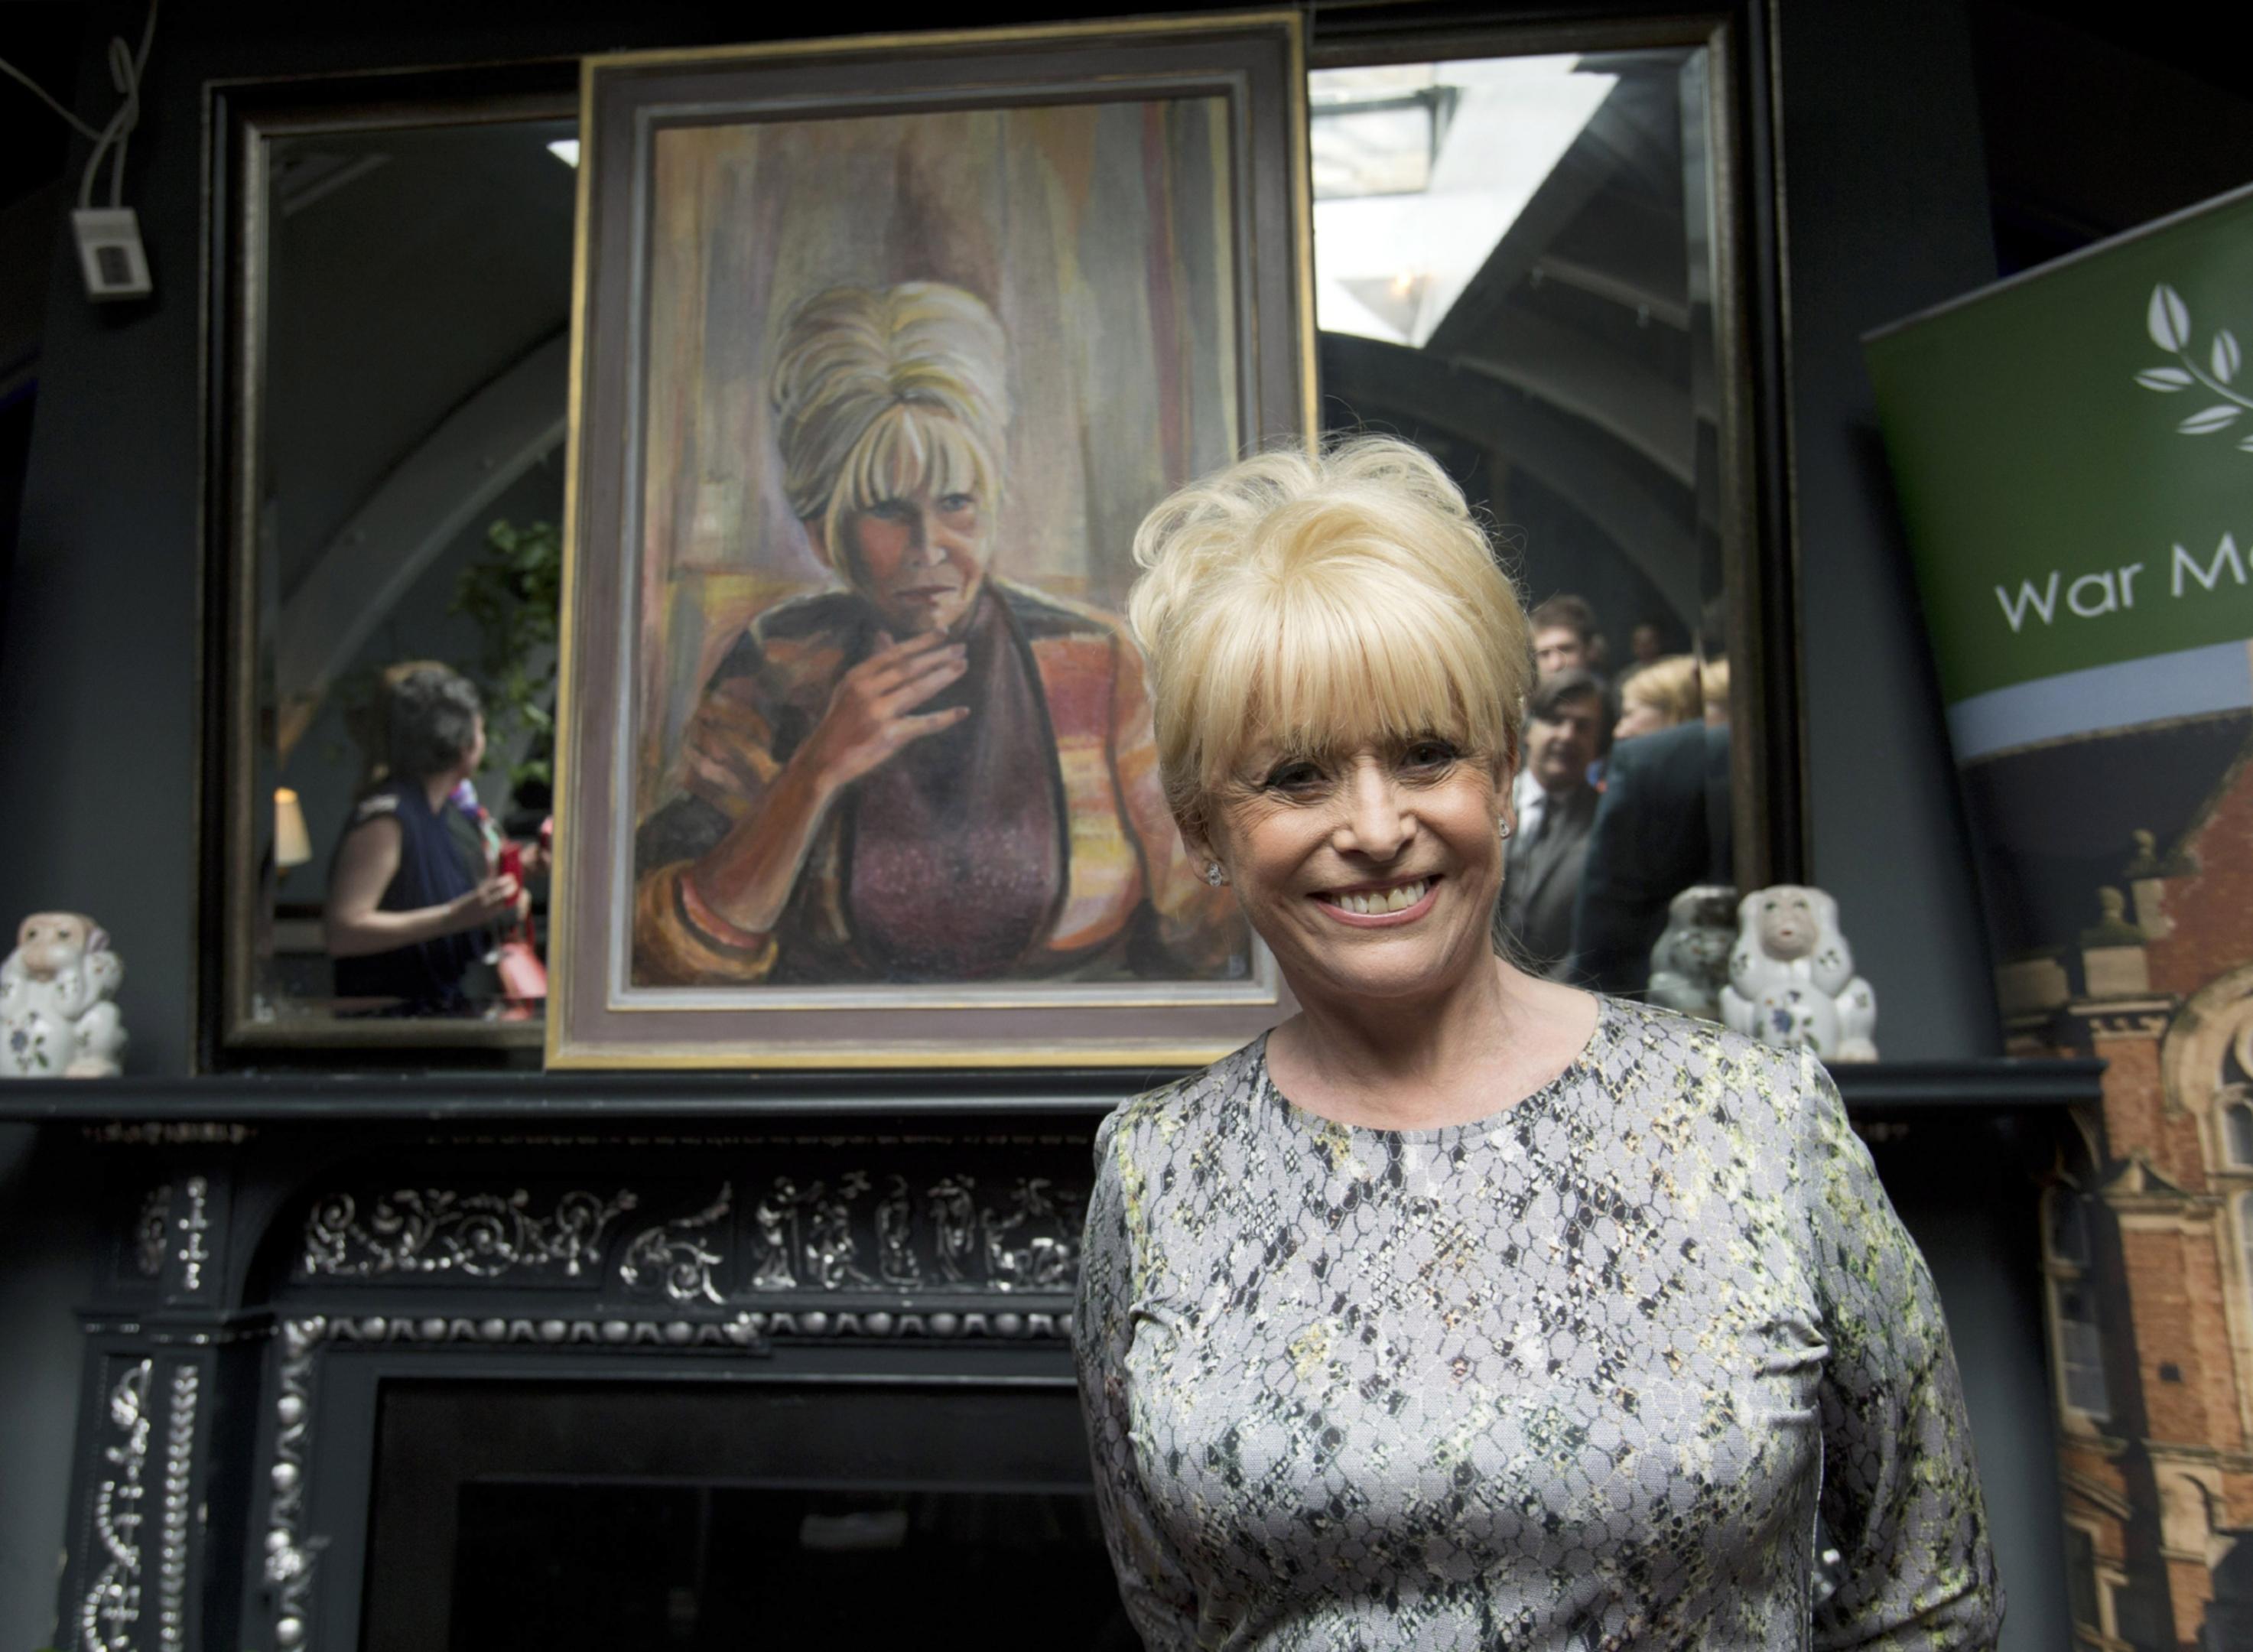 Dame Barbara Windsor unveiling a portrait of herself by Welsh artist Dan Llywelyn Hall.